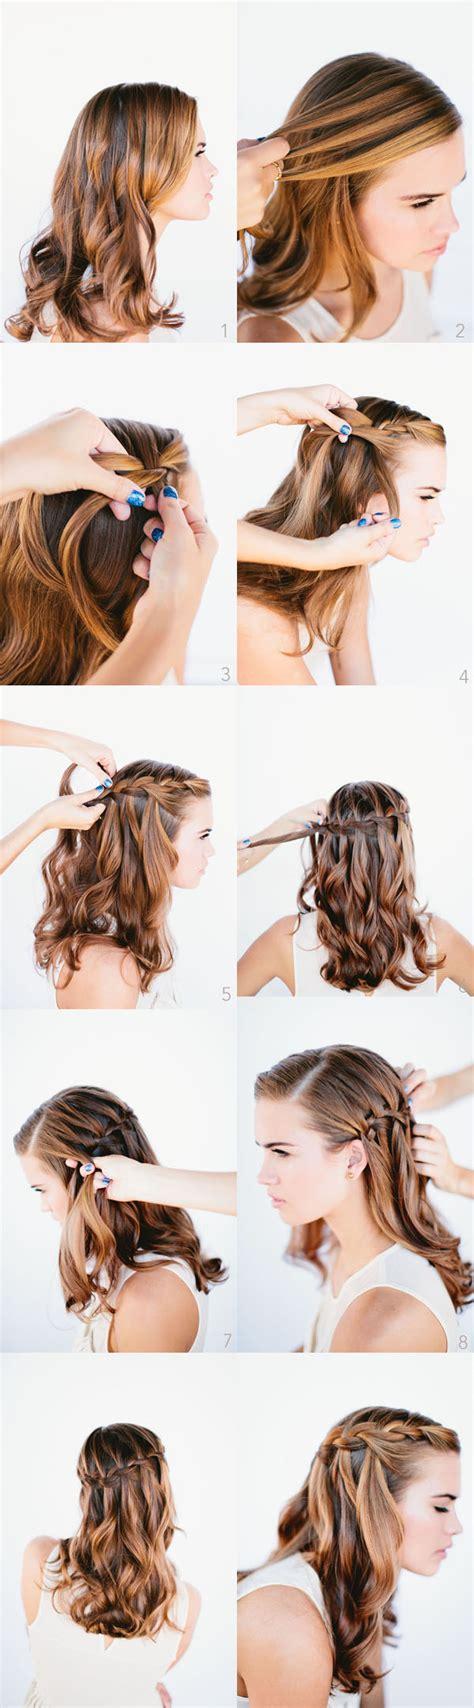 diy wedding hairstyles step by step how to do waterfall braid wedding hairstyle for hairs step by step diy tutorial